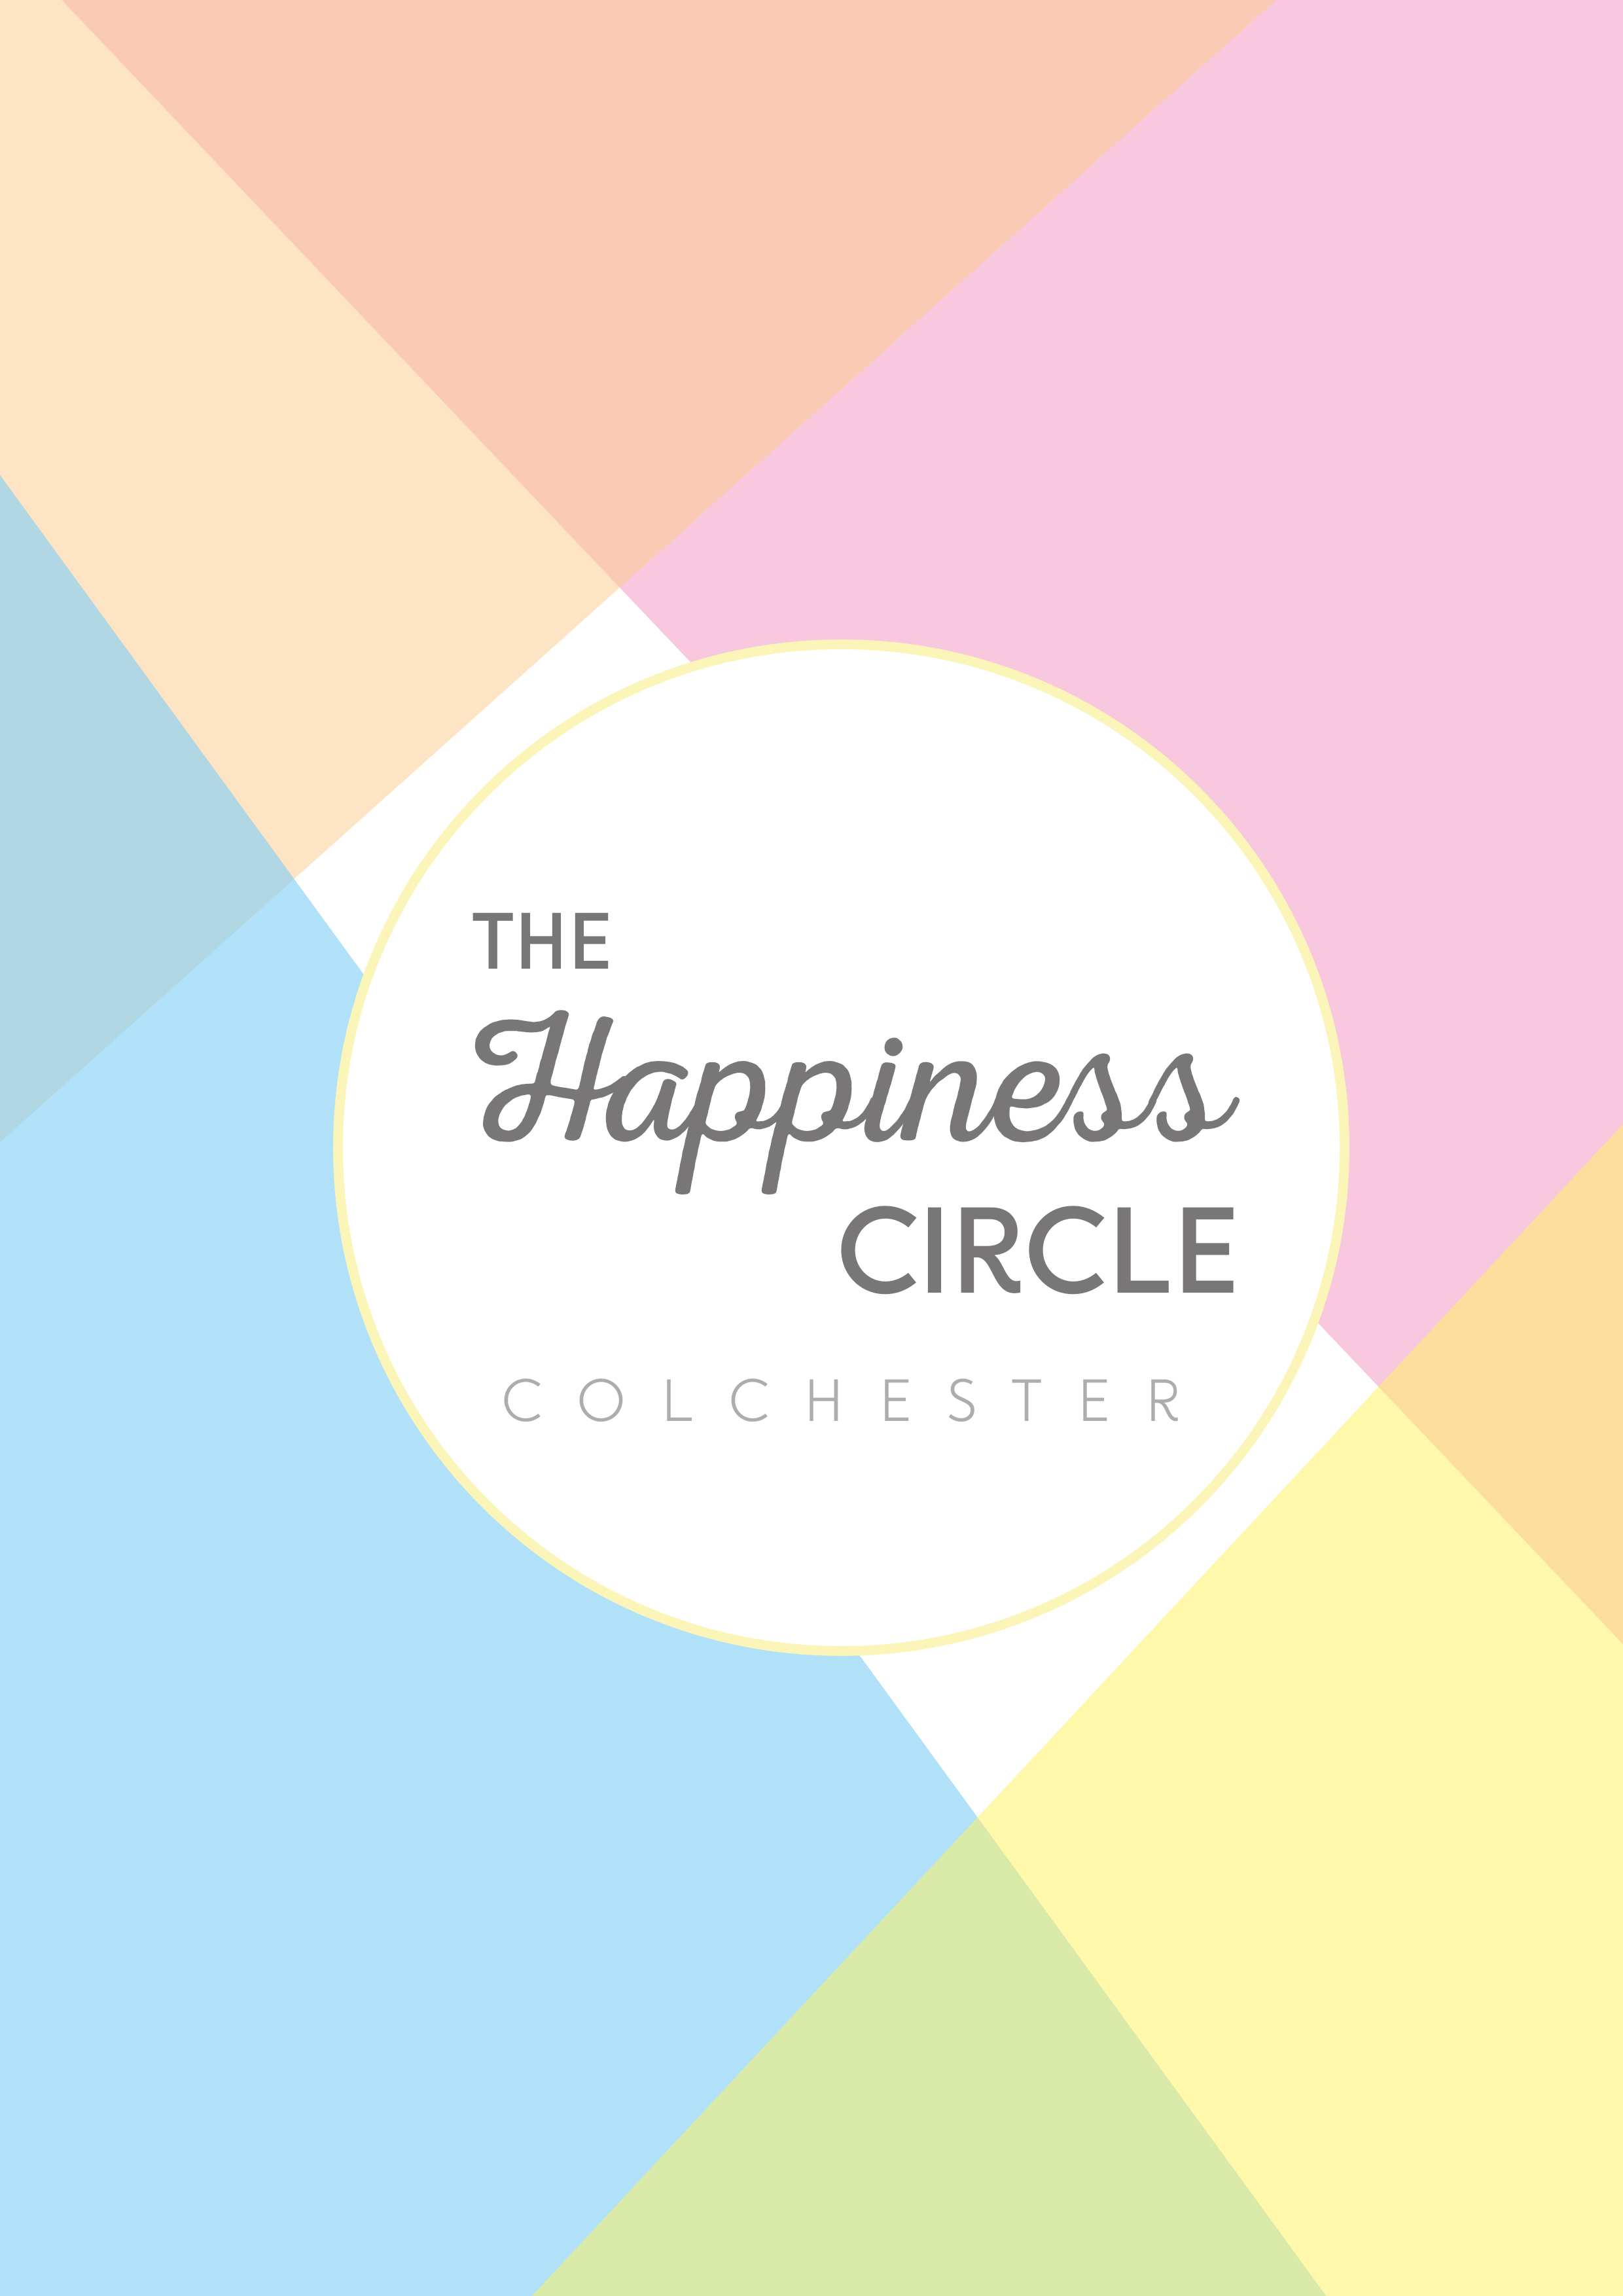 Happiness Circle logo V3 - smaller even background.jpg